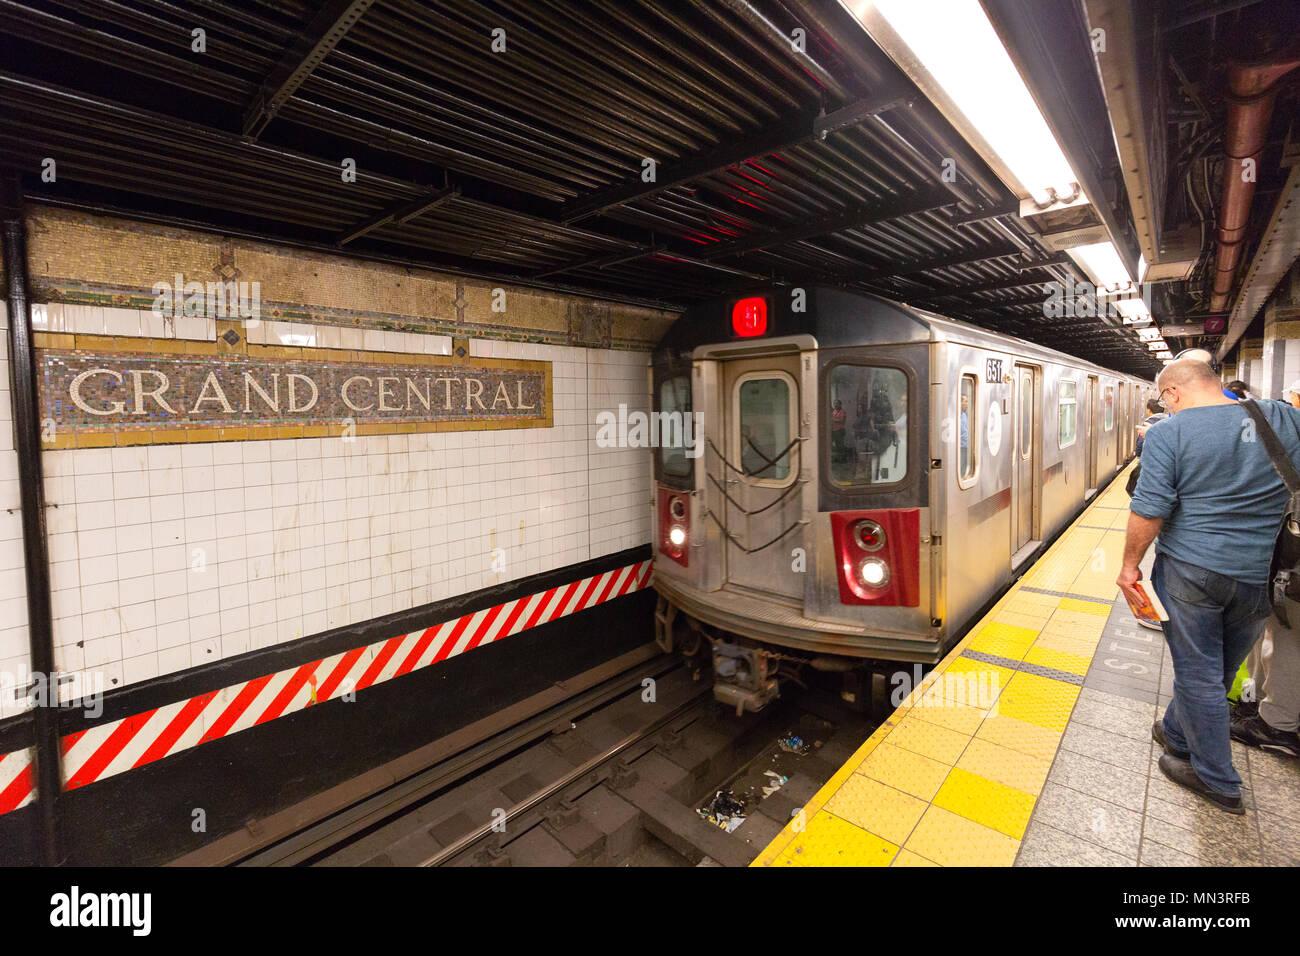 Grand central Subway station, New York subway, Midtown New York city, USA - Stock Image